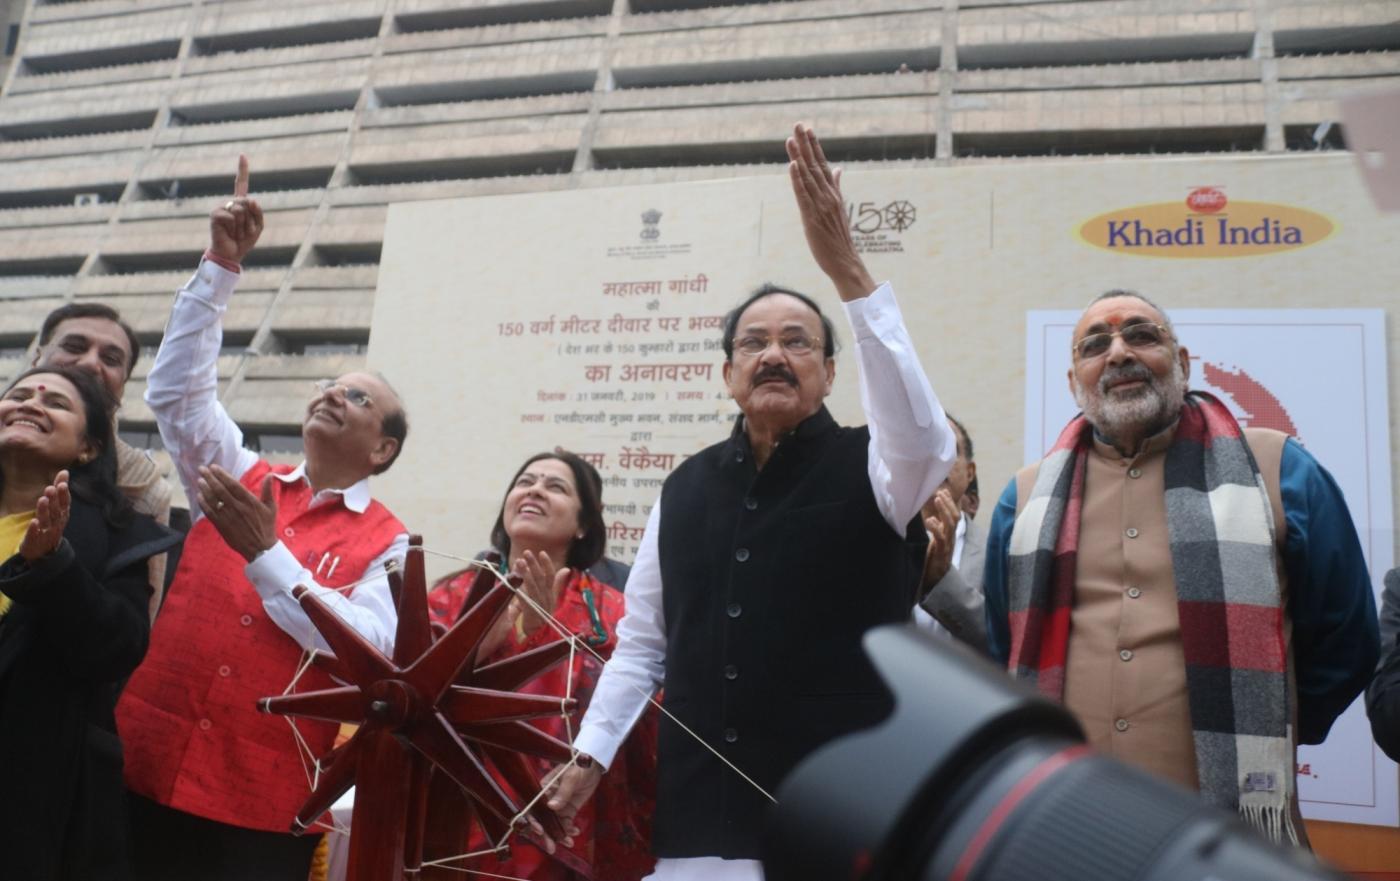 New Delhi: New Delhi: Vice President M Venkaiah Naidu during a programme organised to unveil Grand Wall Mural of Mahatma Gandhi at NDMC Headquarter Building in New Delhi on Jan 31, 2019. (Photo: IANS) by .